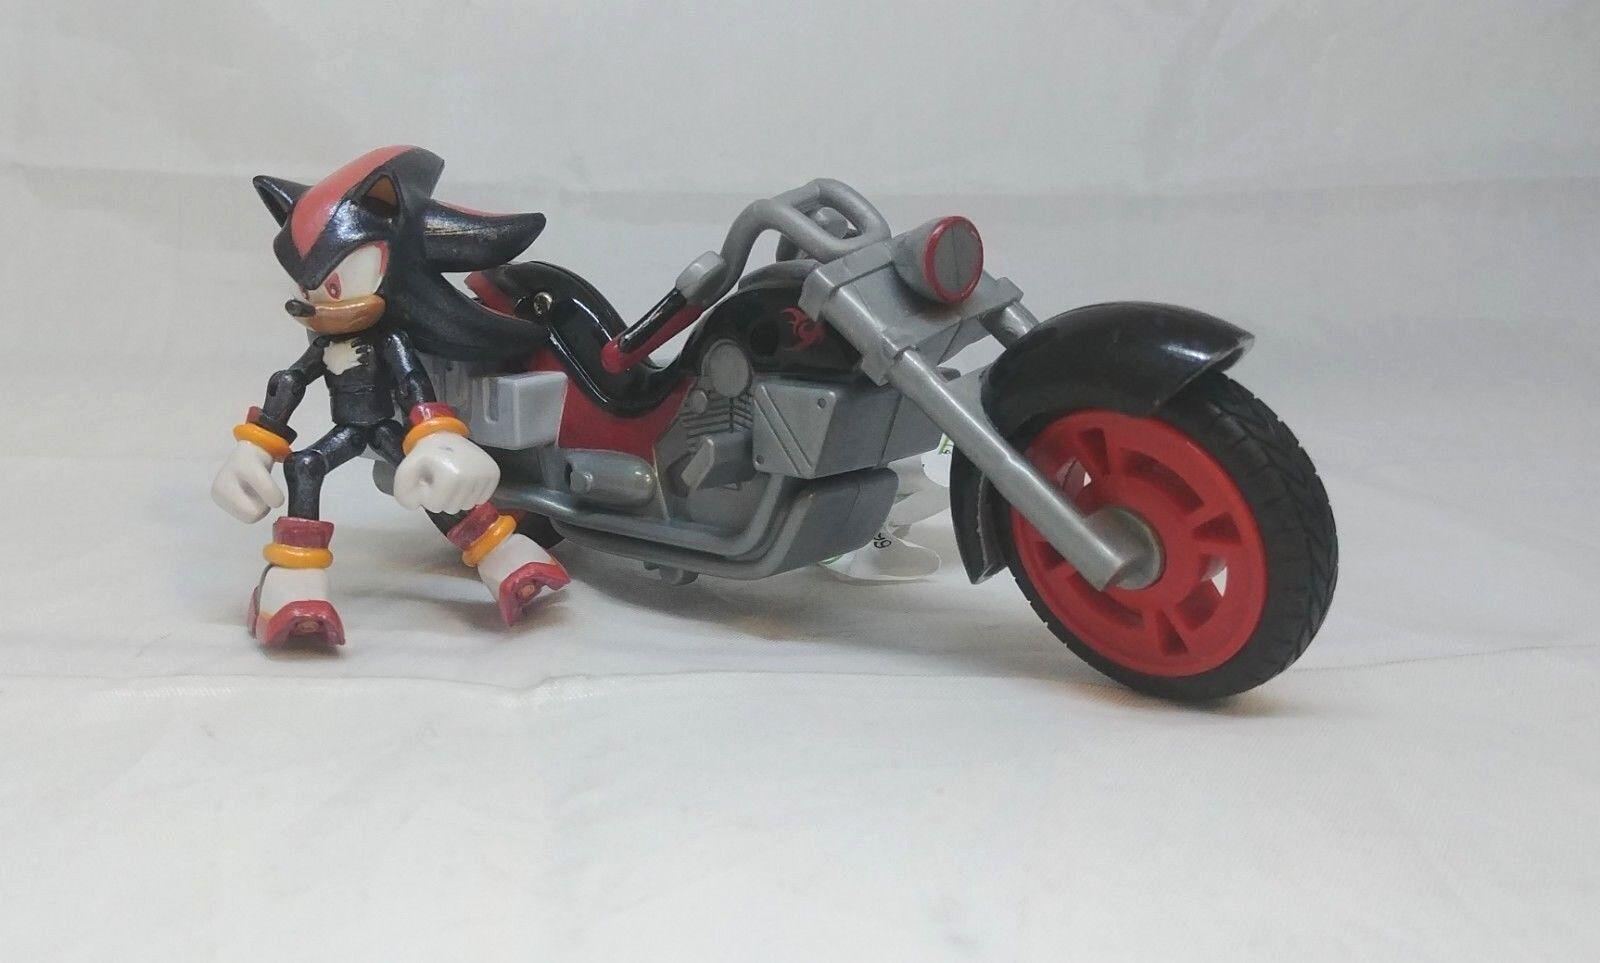 Jazwares Shadow the Hedgehog Action Figure on Motorcycle Sega All-Stars Racing